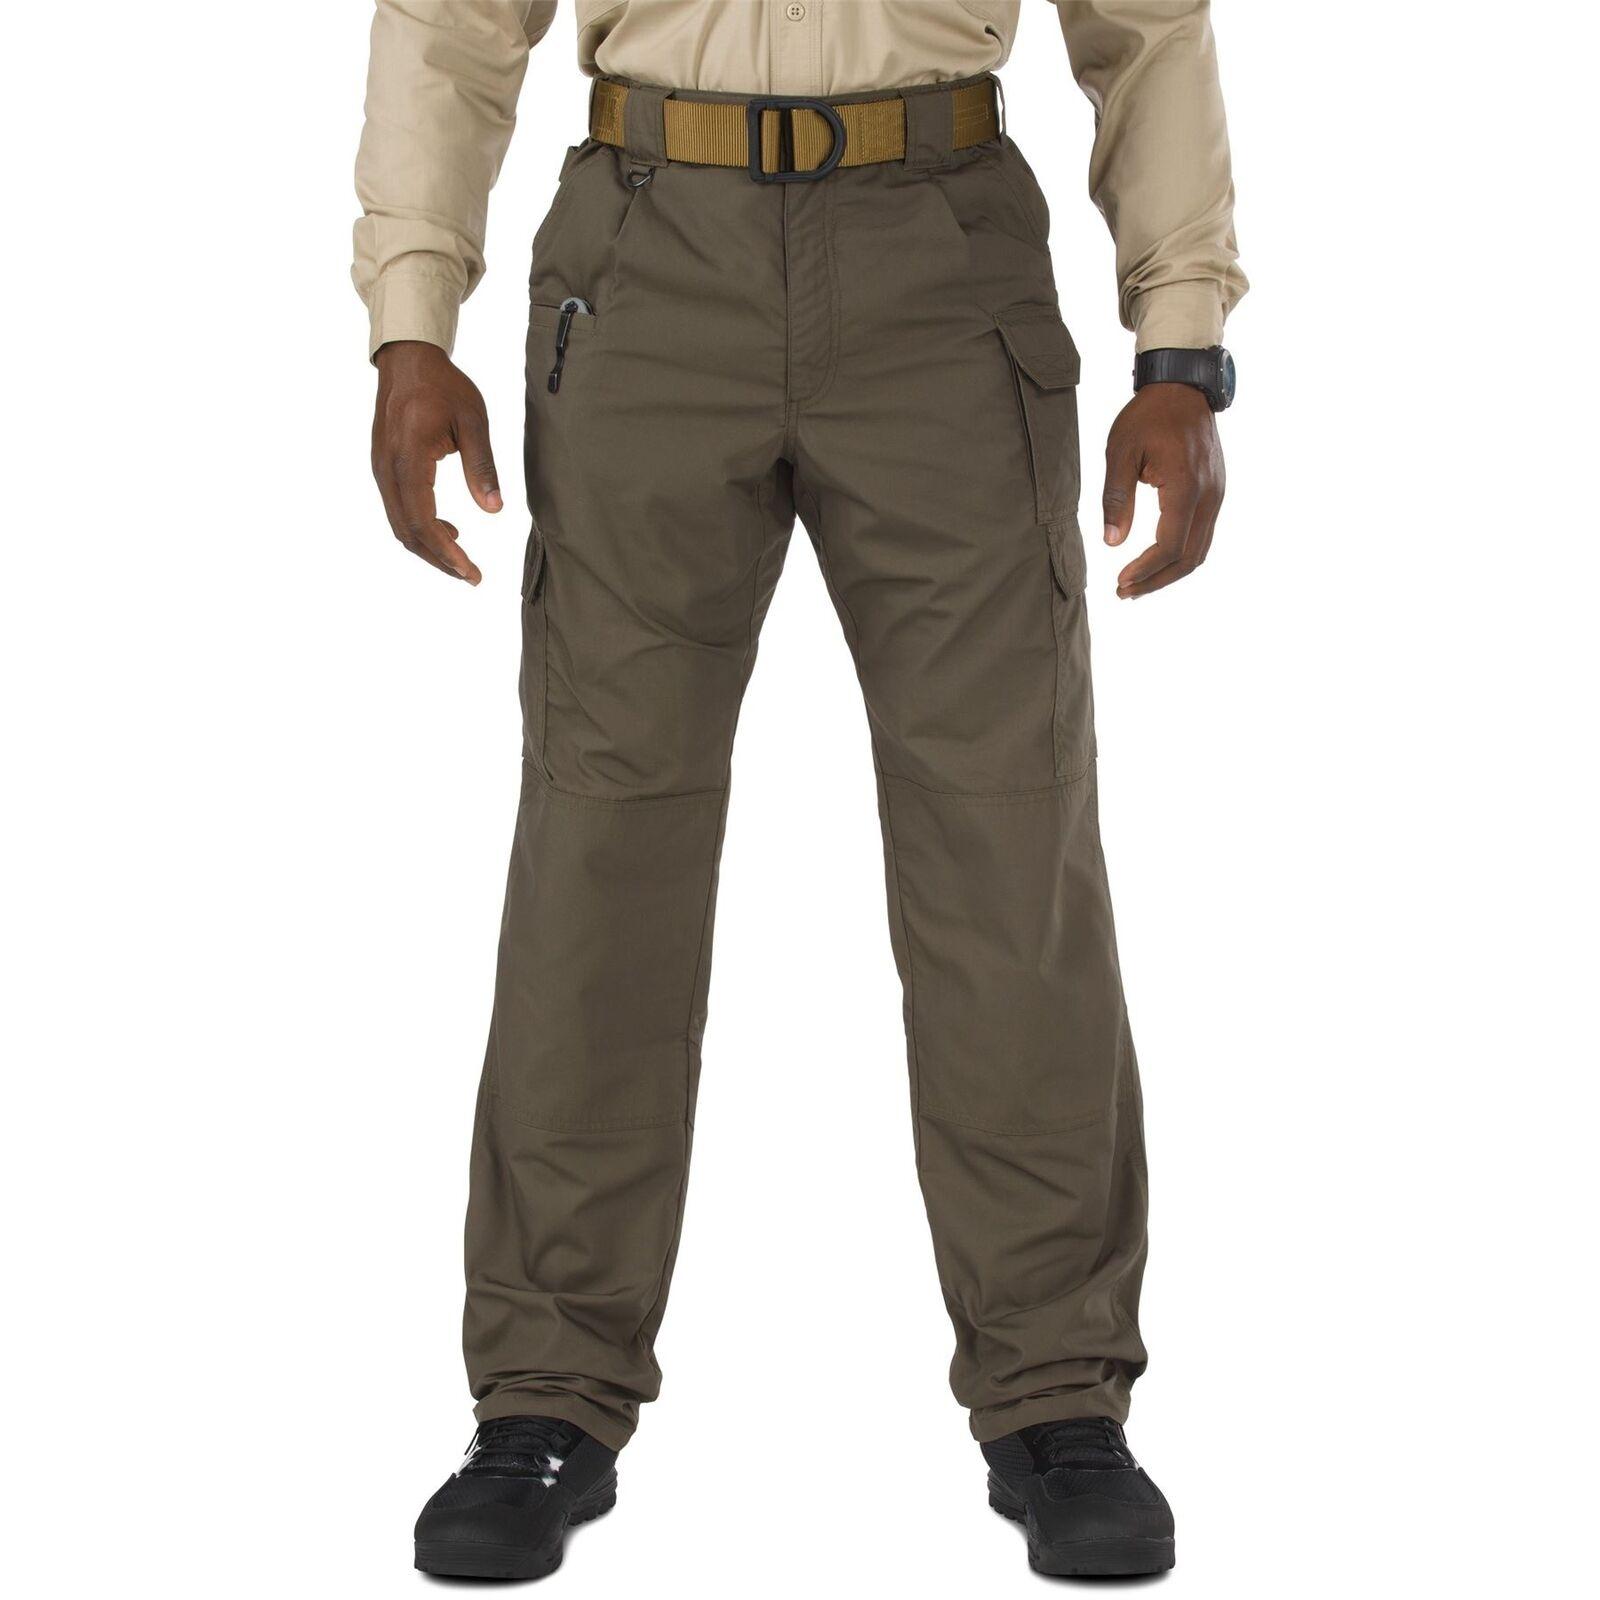 5.11 Taclite Pro Trousers - (Tundra)